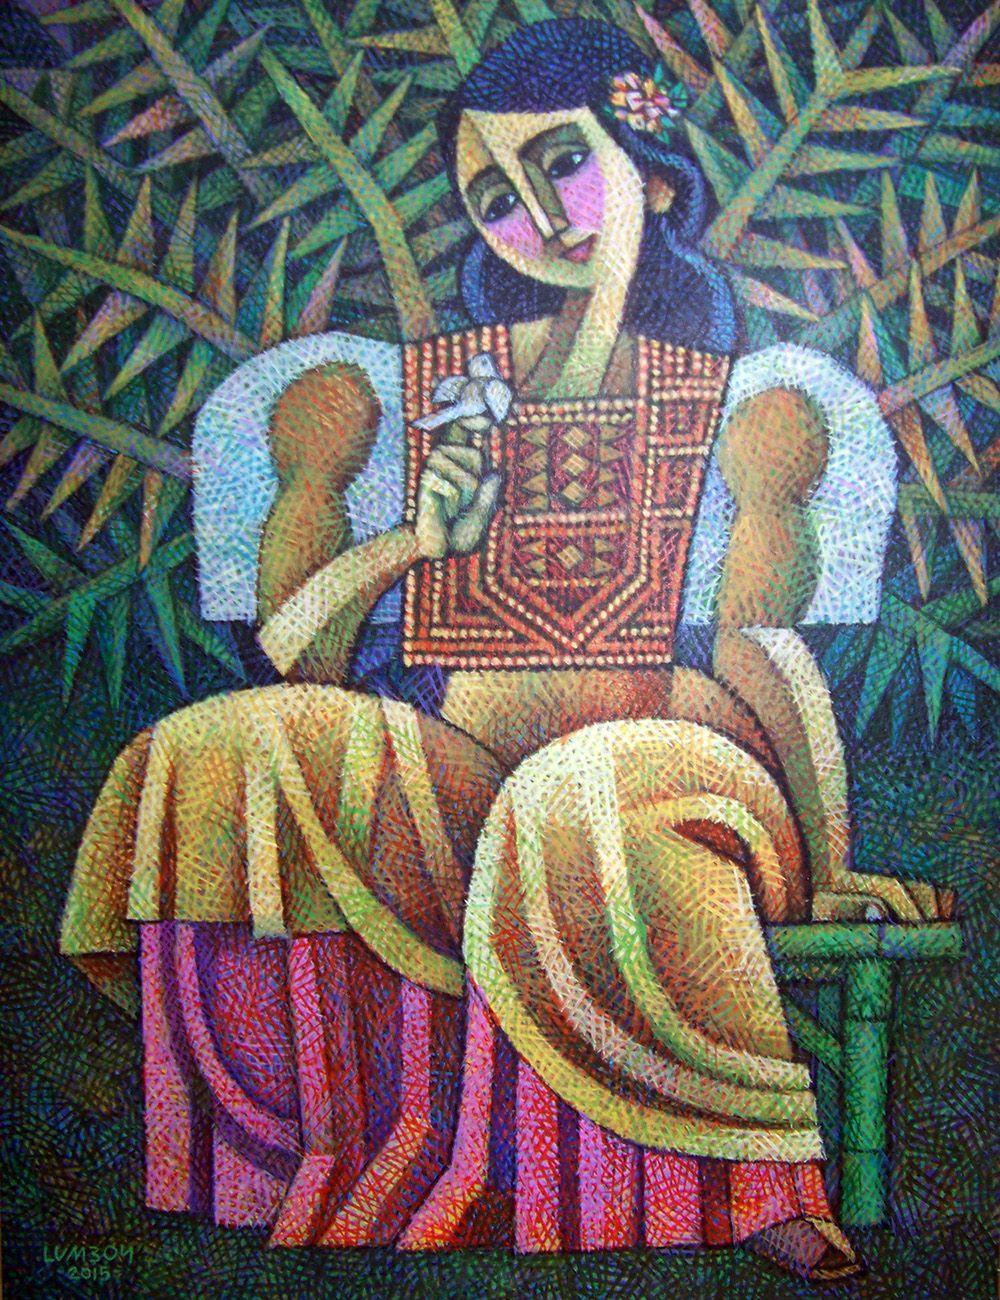 In The Garden By Ninoy Lumboy A Filipino Artist Filipino Art Art Appreciation Philippine Art